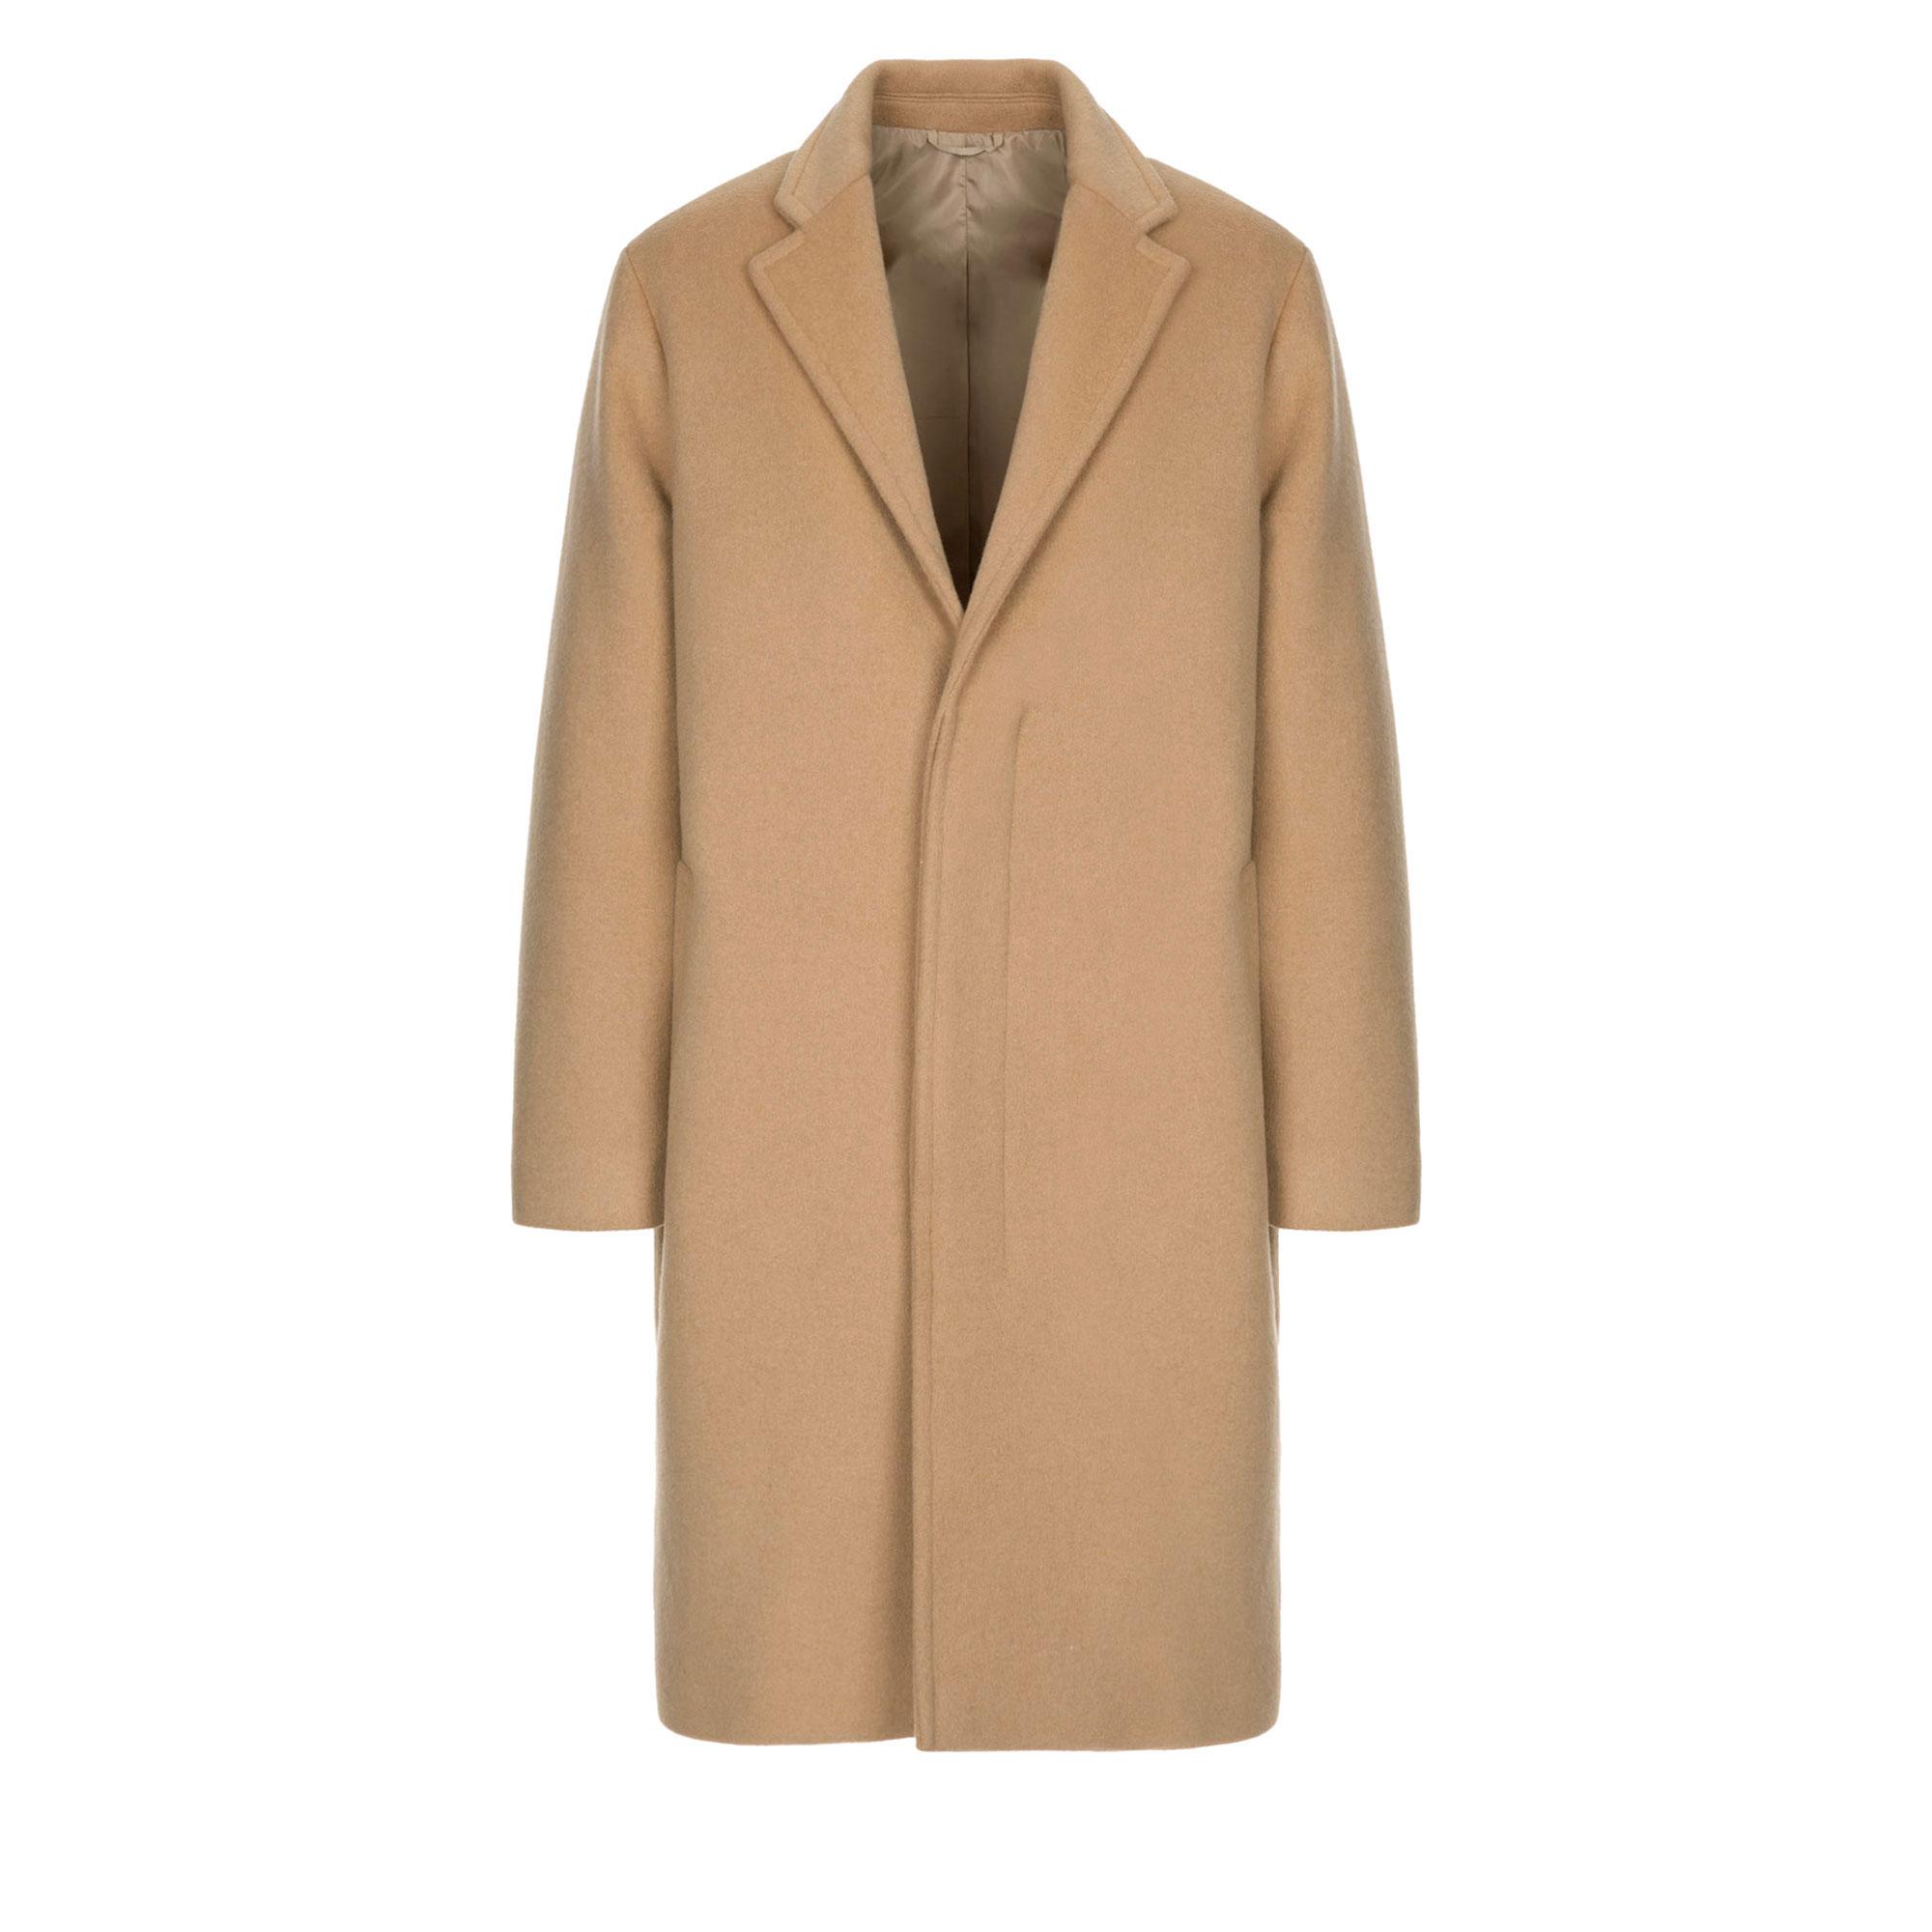 hidden button wool single coat / beige